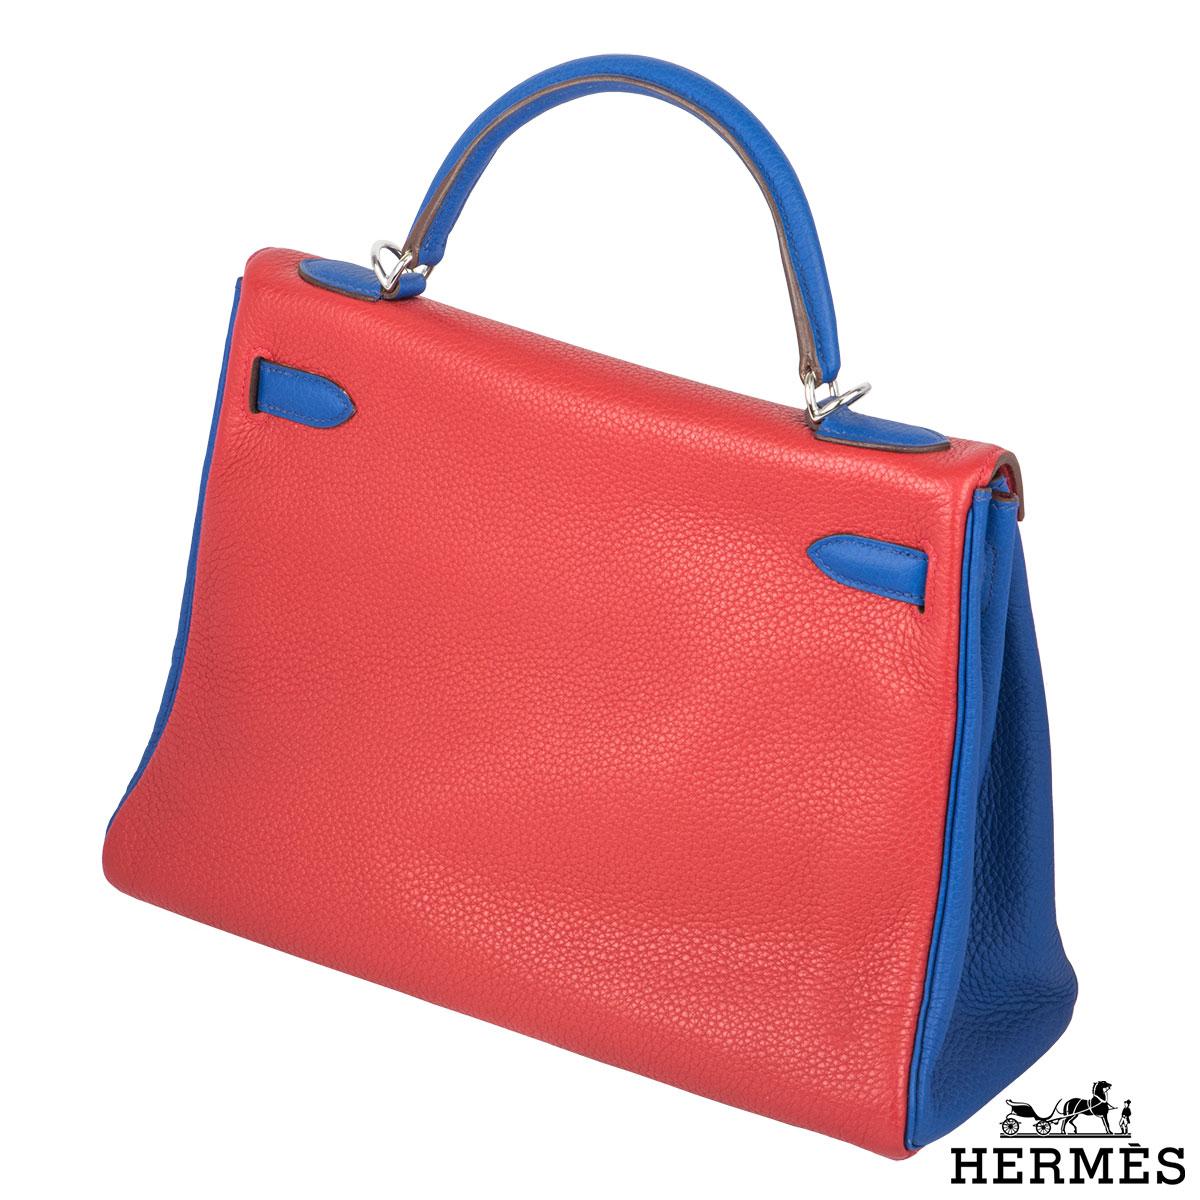 Hermès 32cm PHW Horseshoe Kelly Bag